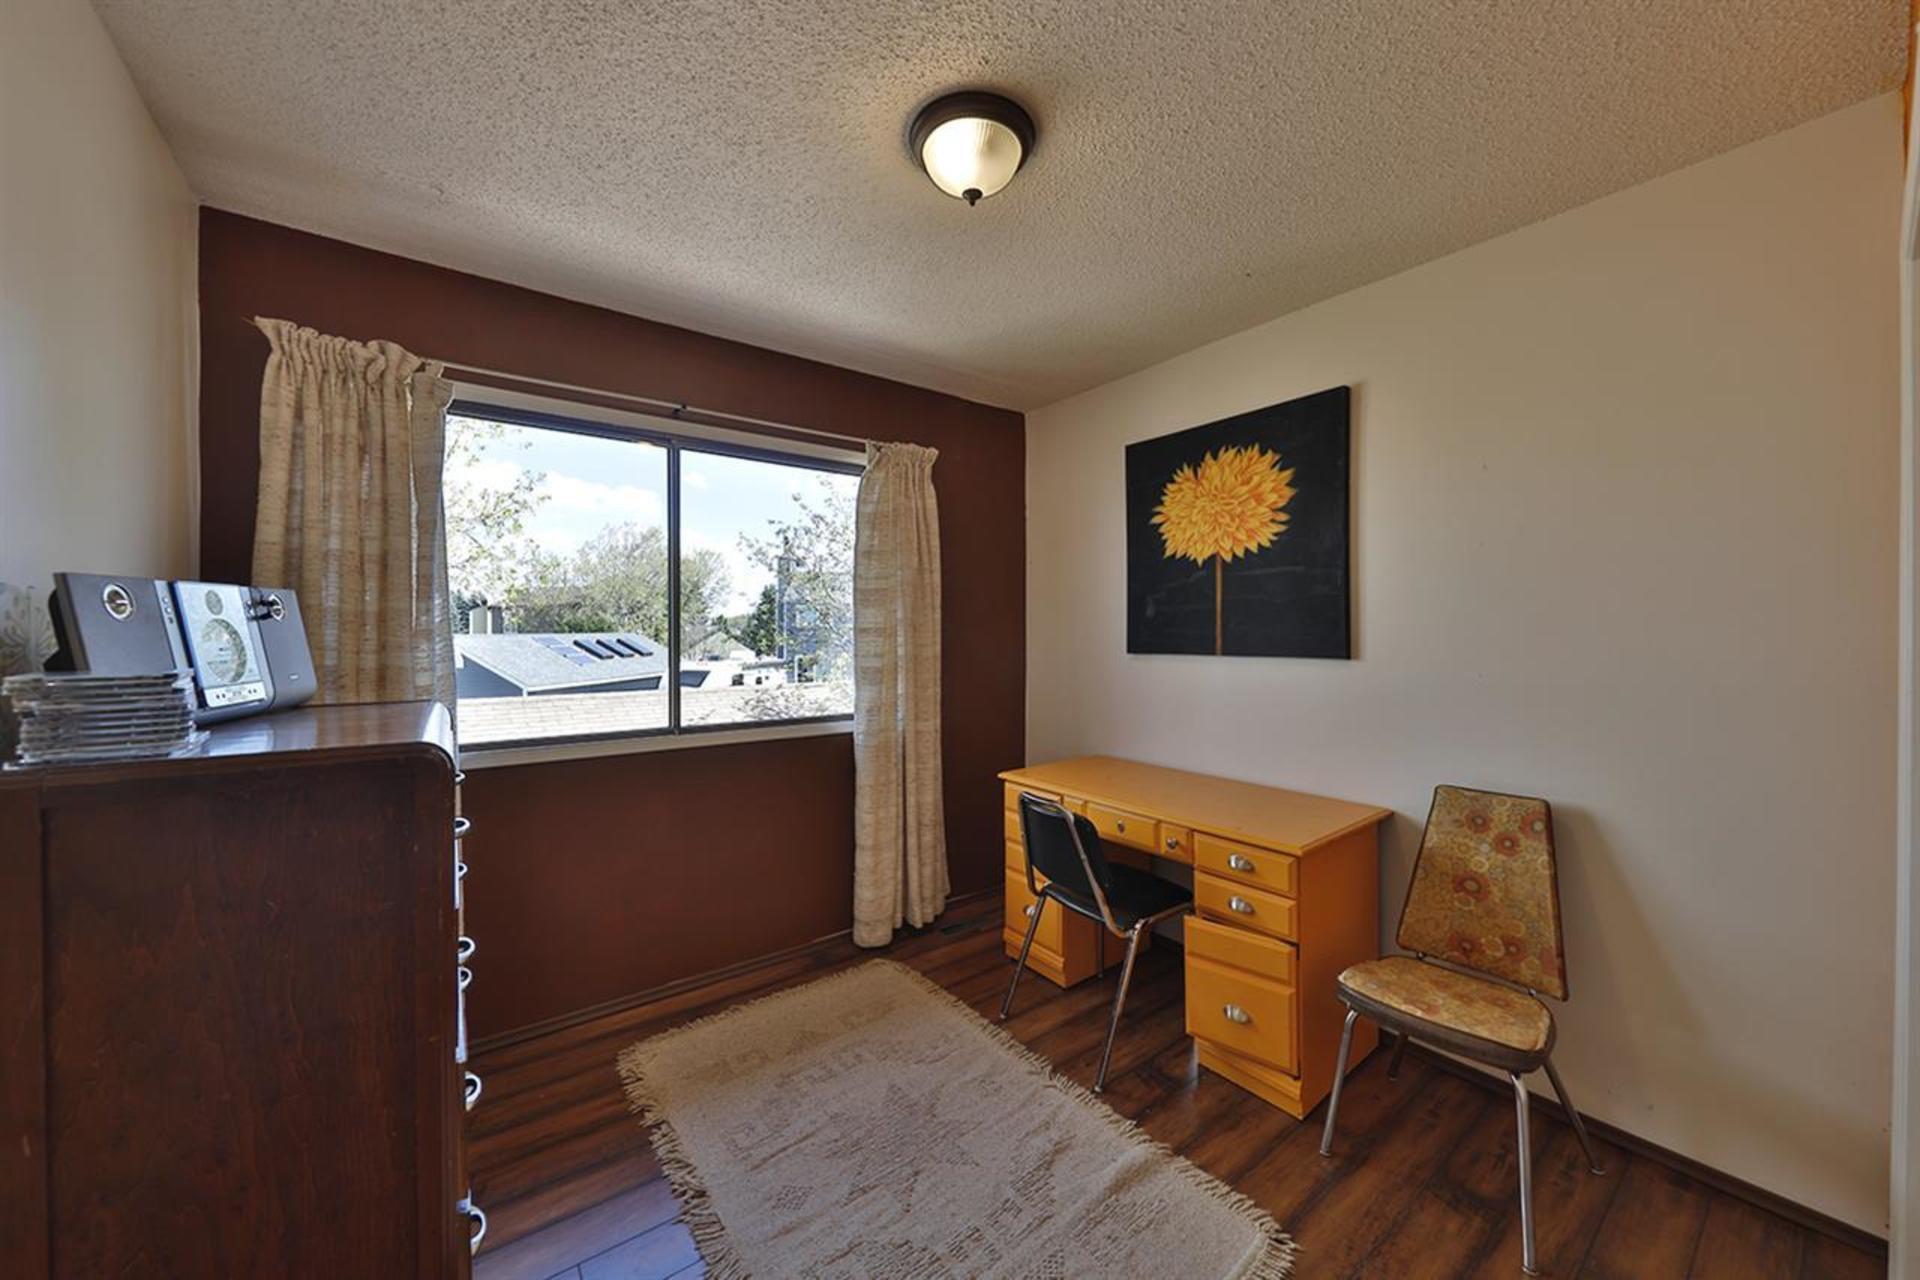 14111-117-street-carlisle-edmonton-12 at 14111 117 Street, Carlisle, Edmonton